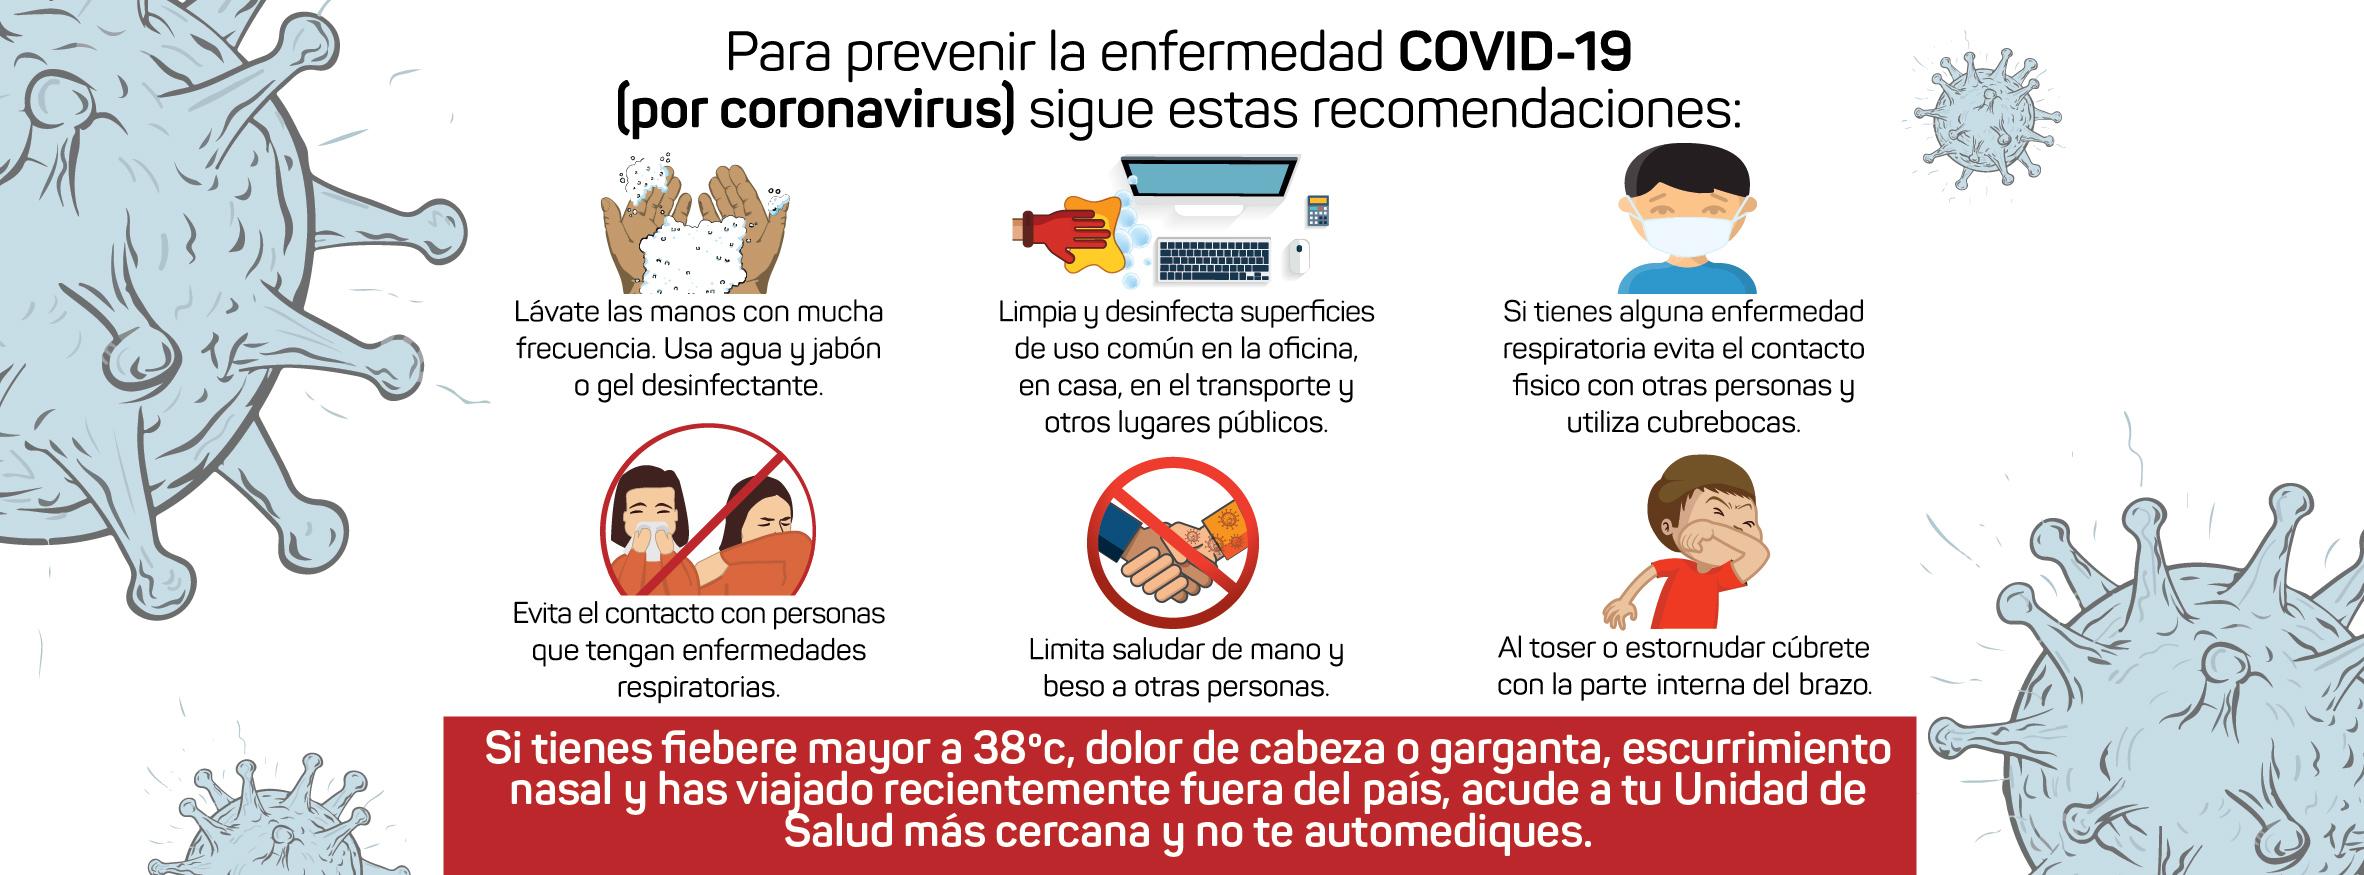 https://0201.nccdn.net/1_2/000/000/175/7da/coronavirusH-01.jpg